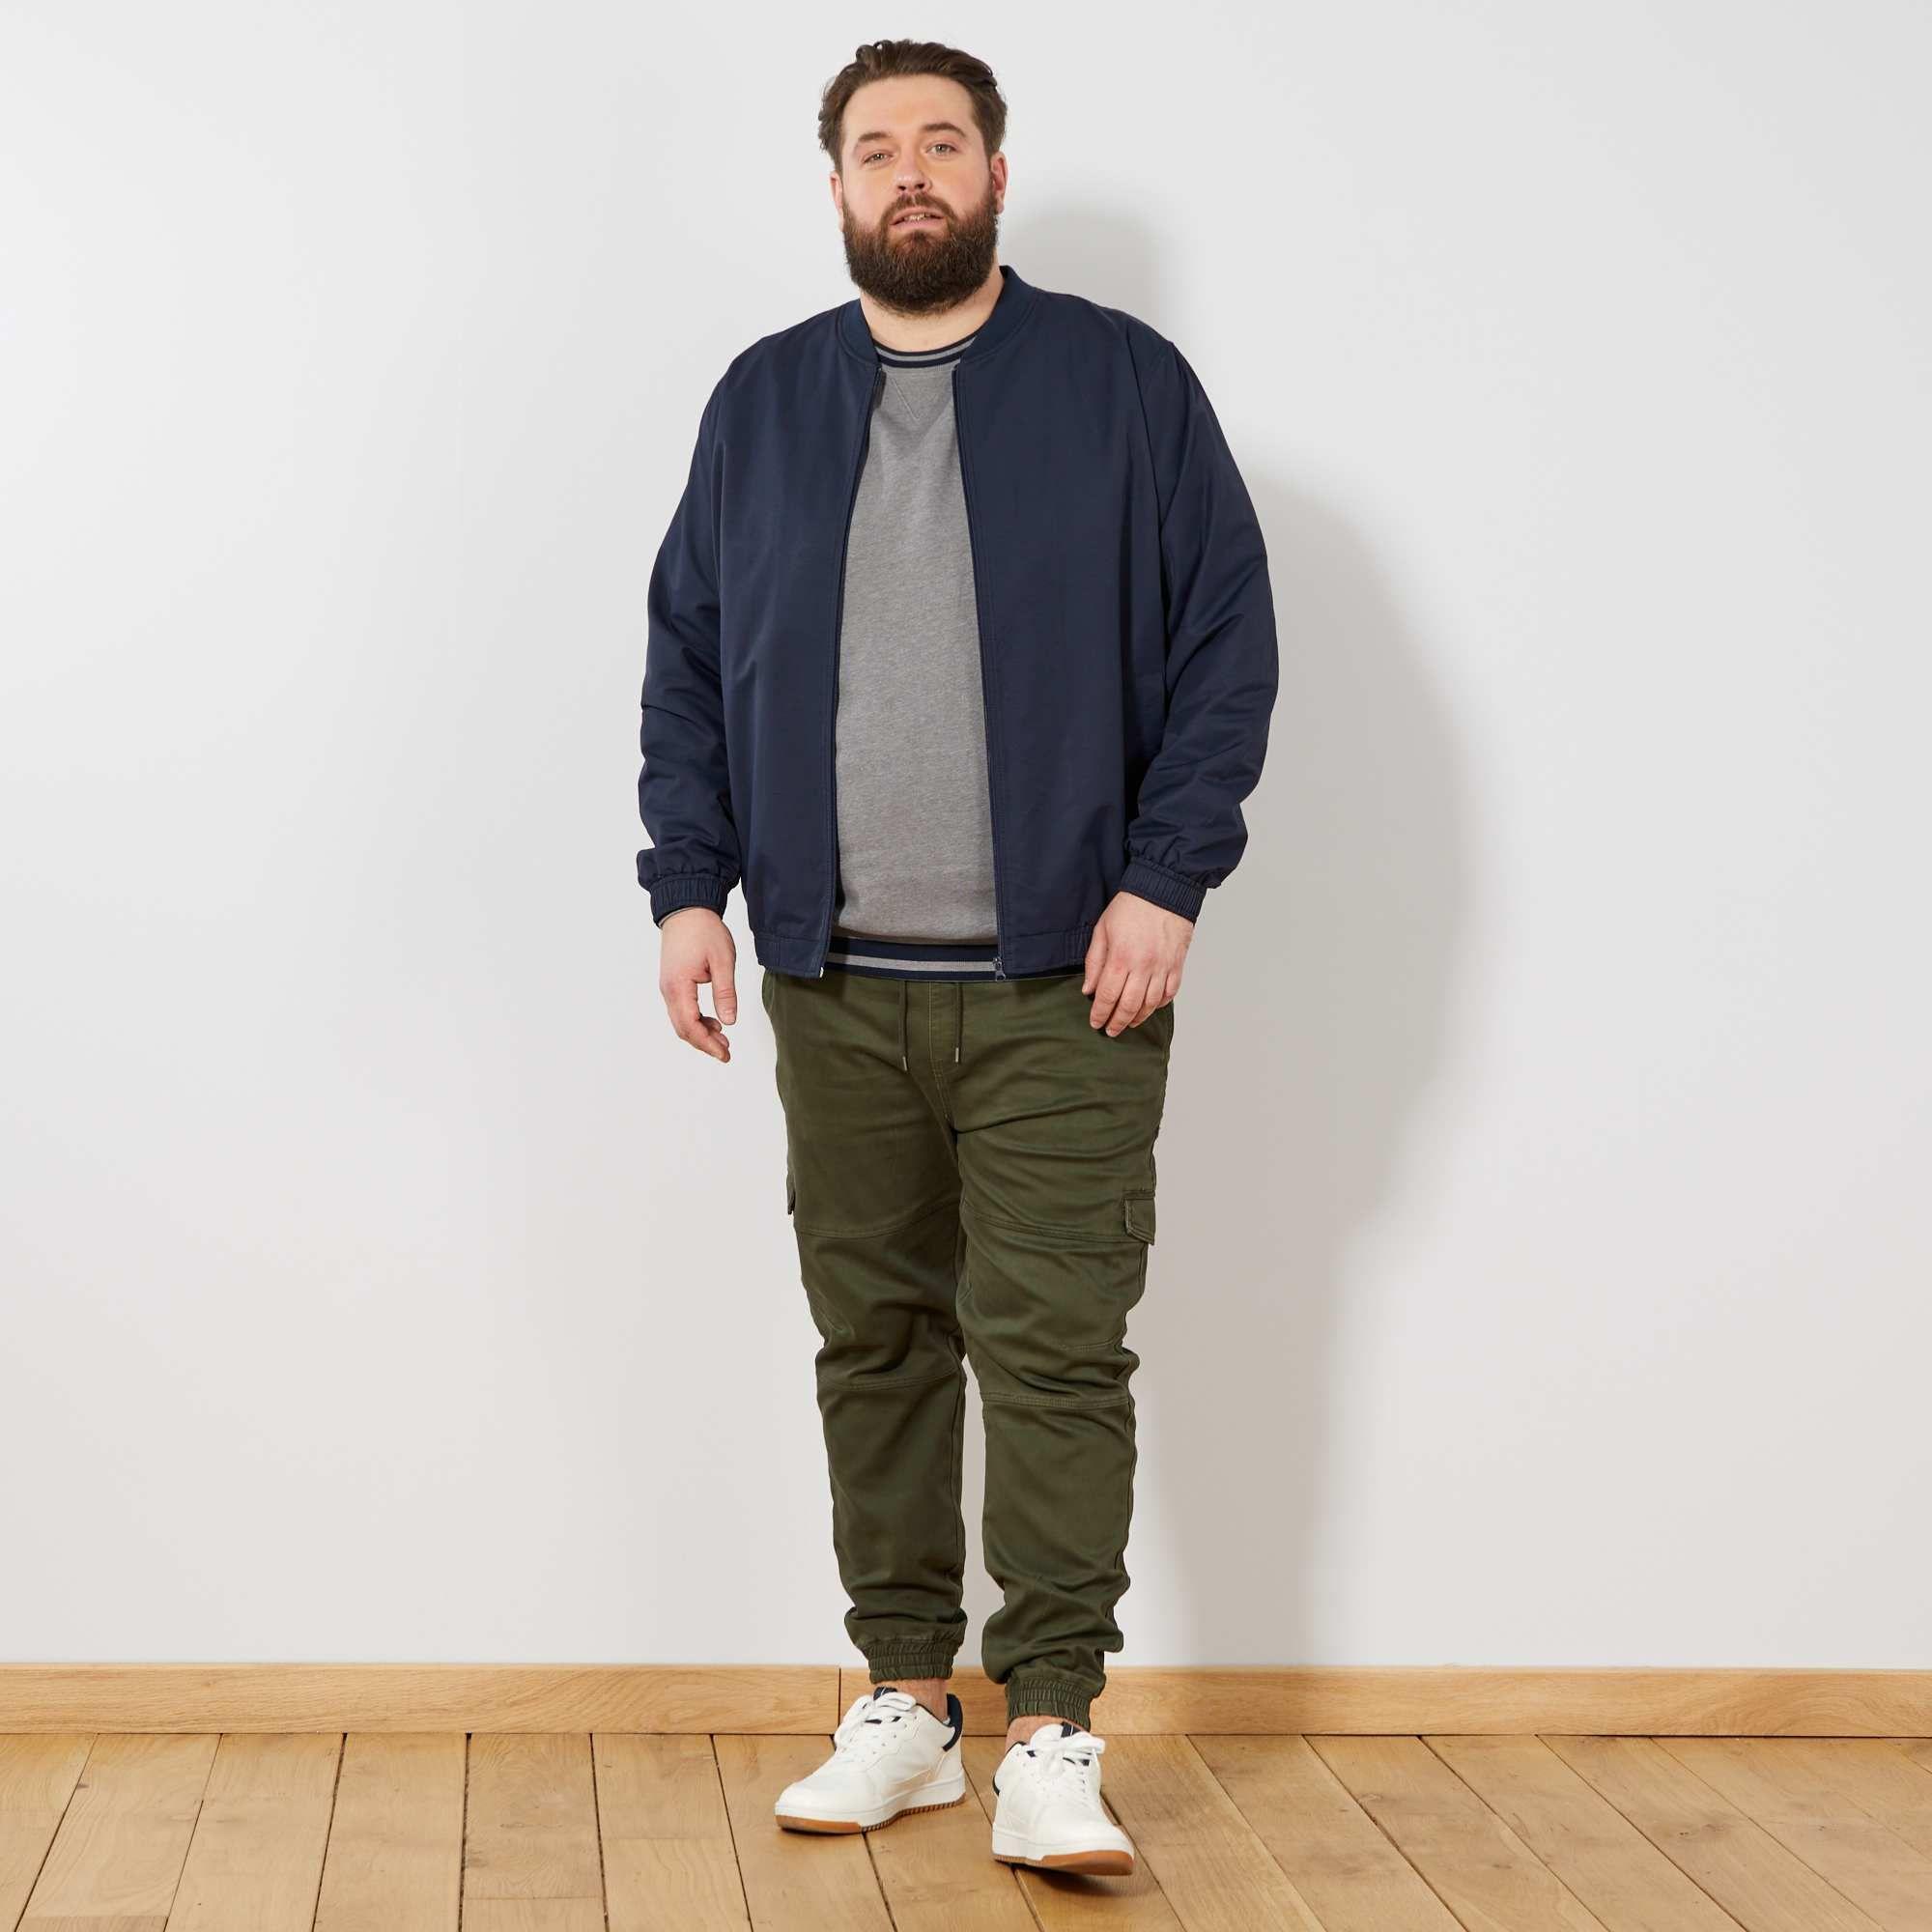 386633b6b7a1 Pantaloni cargo stile pantaloni da tuta Taglie forti uomo - verde selva -  Kiabi - 25